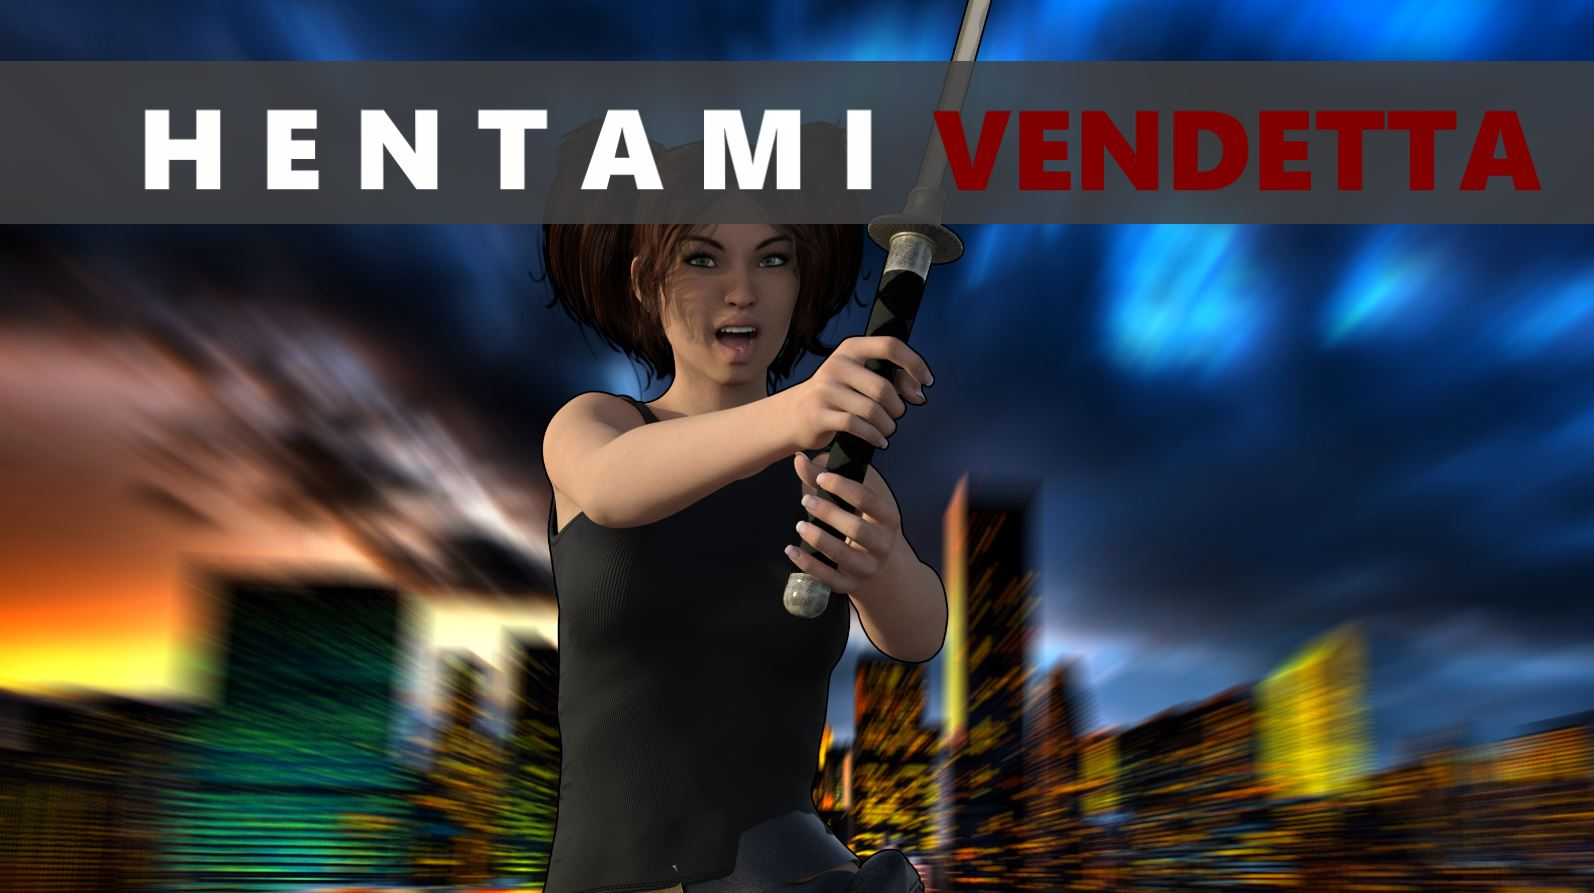 Hentami Vendetta – Version 4.0 - Patreon family incest sex PC game 4